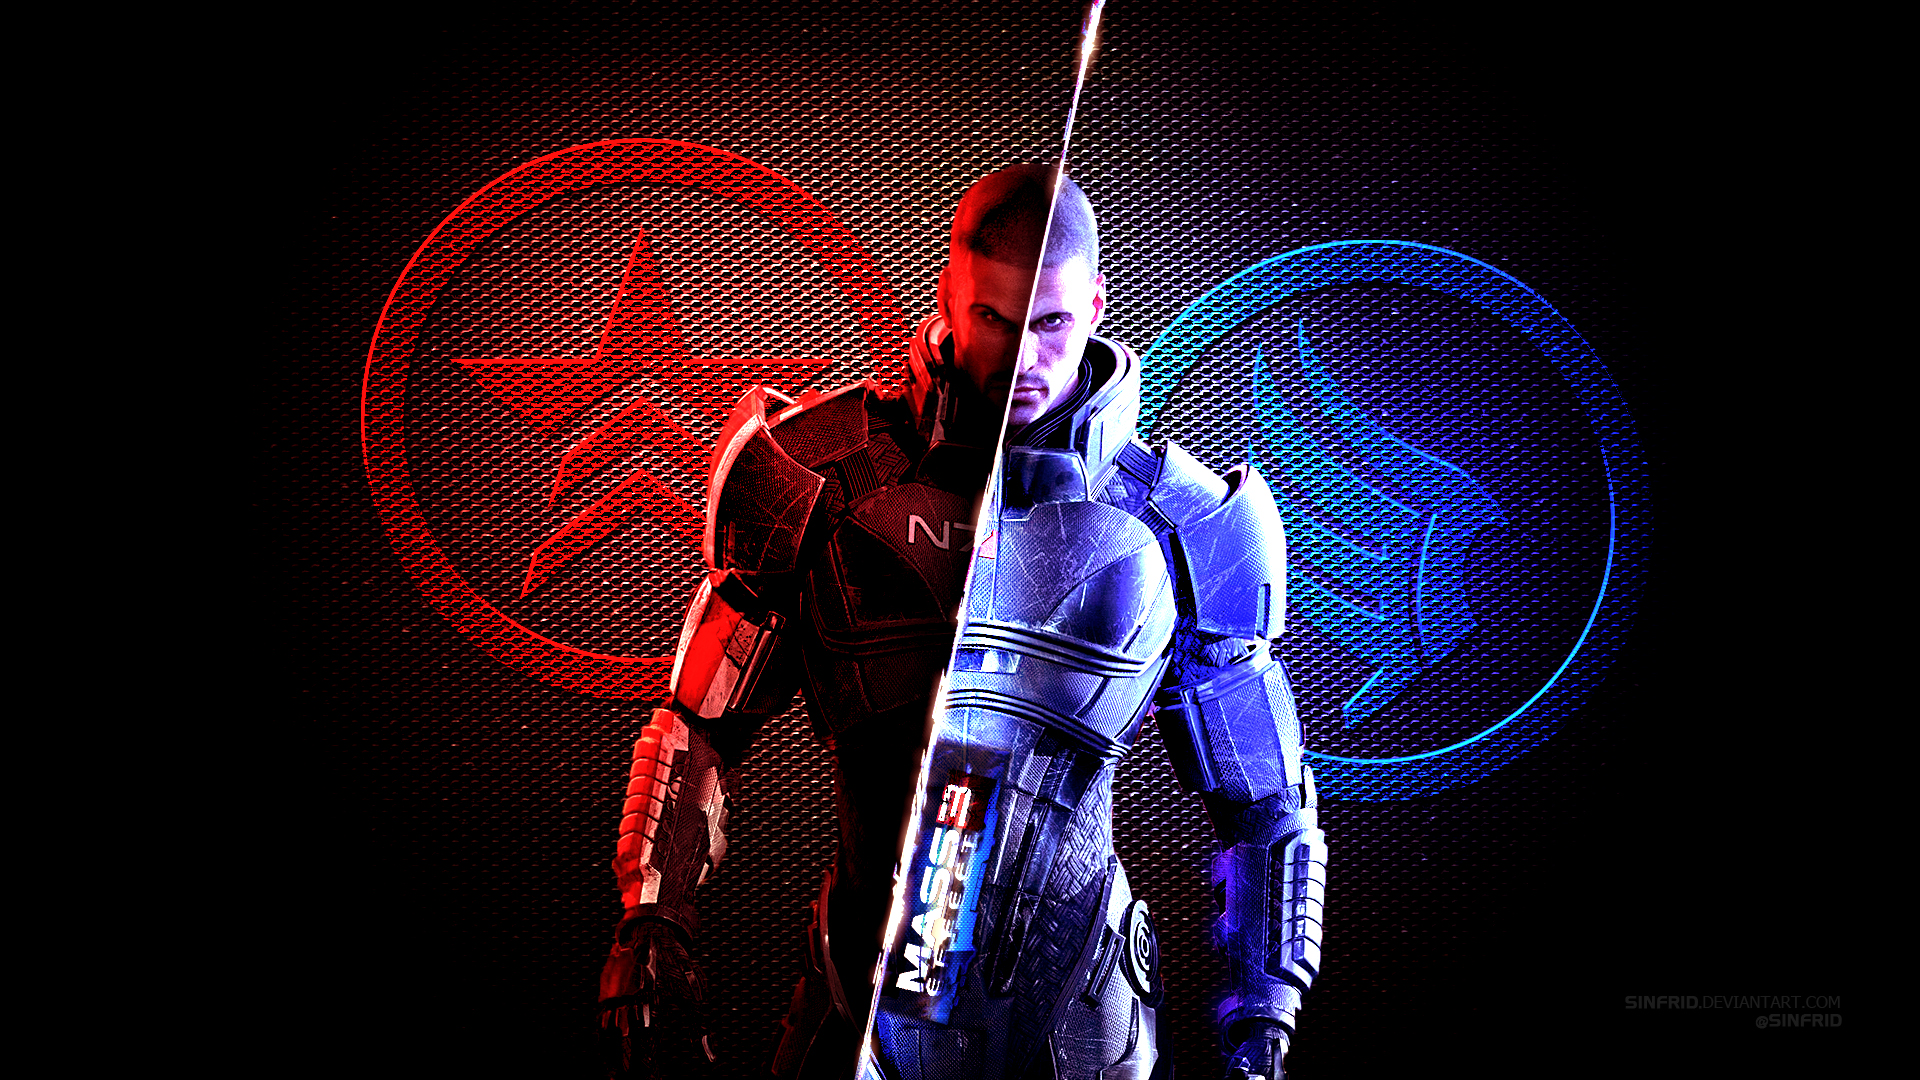 Mass Effect HD Wallpaper | Background Image | 1920x1080 ...